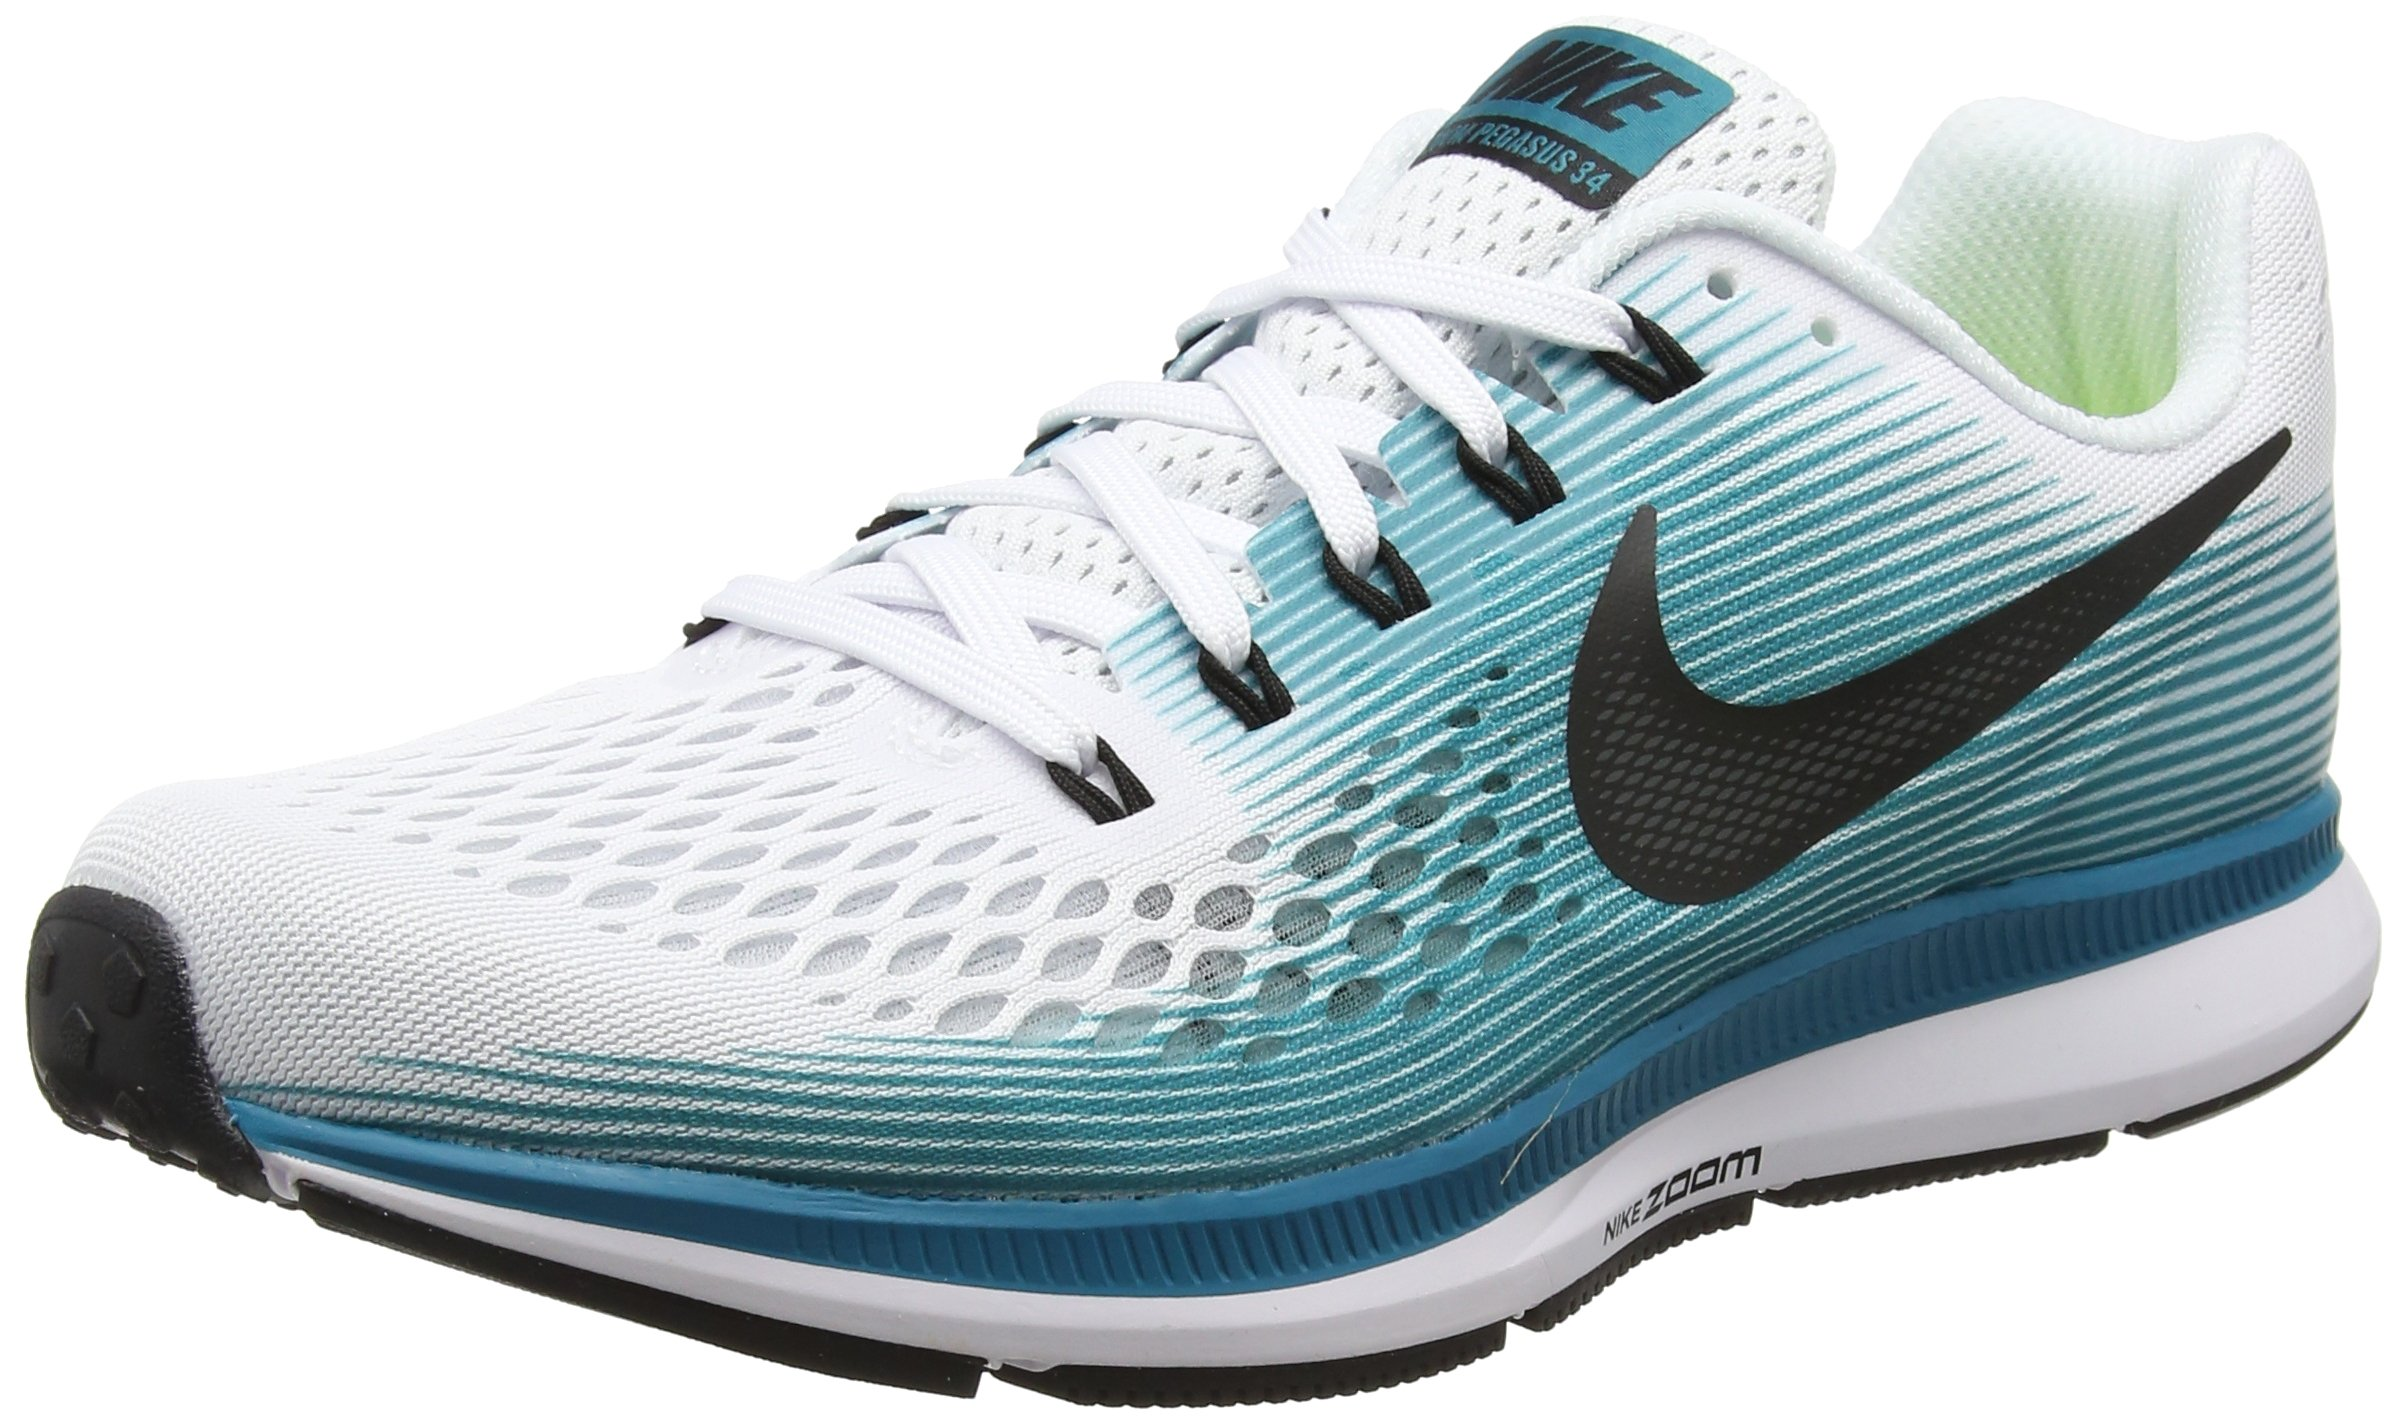 Nike Men's Air Zoom Pegasus 34, WHITE/BLACK/BLUSTERY, 12 M US